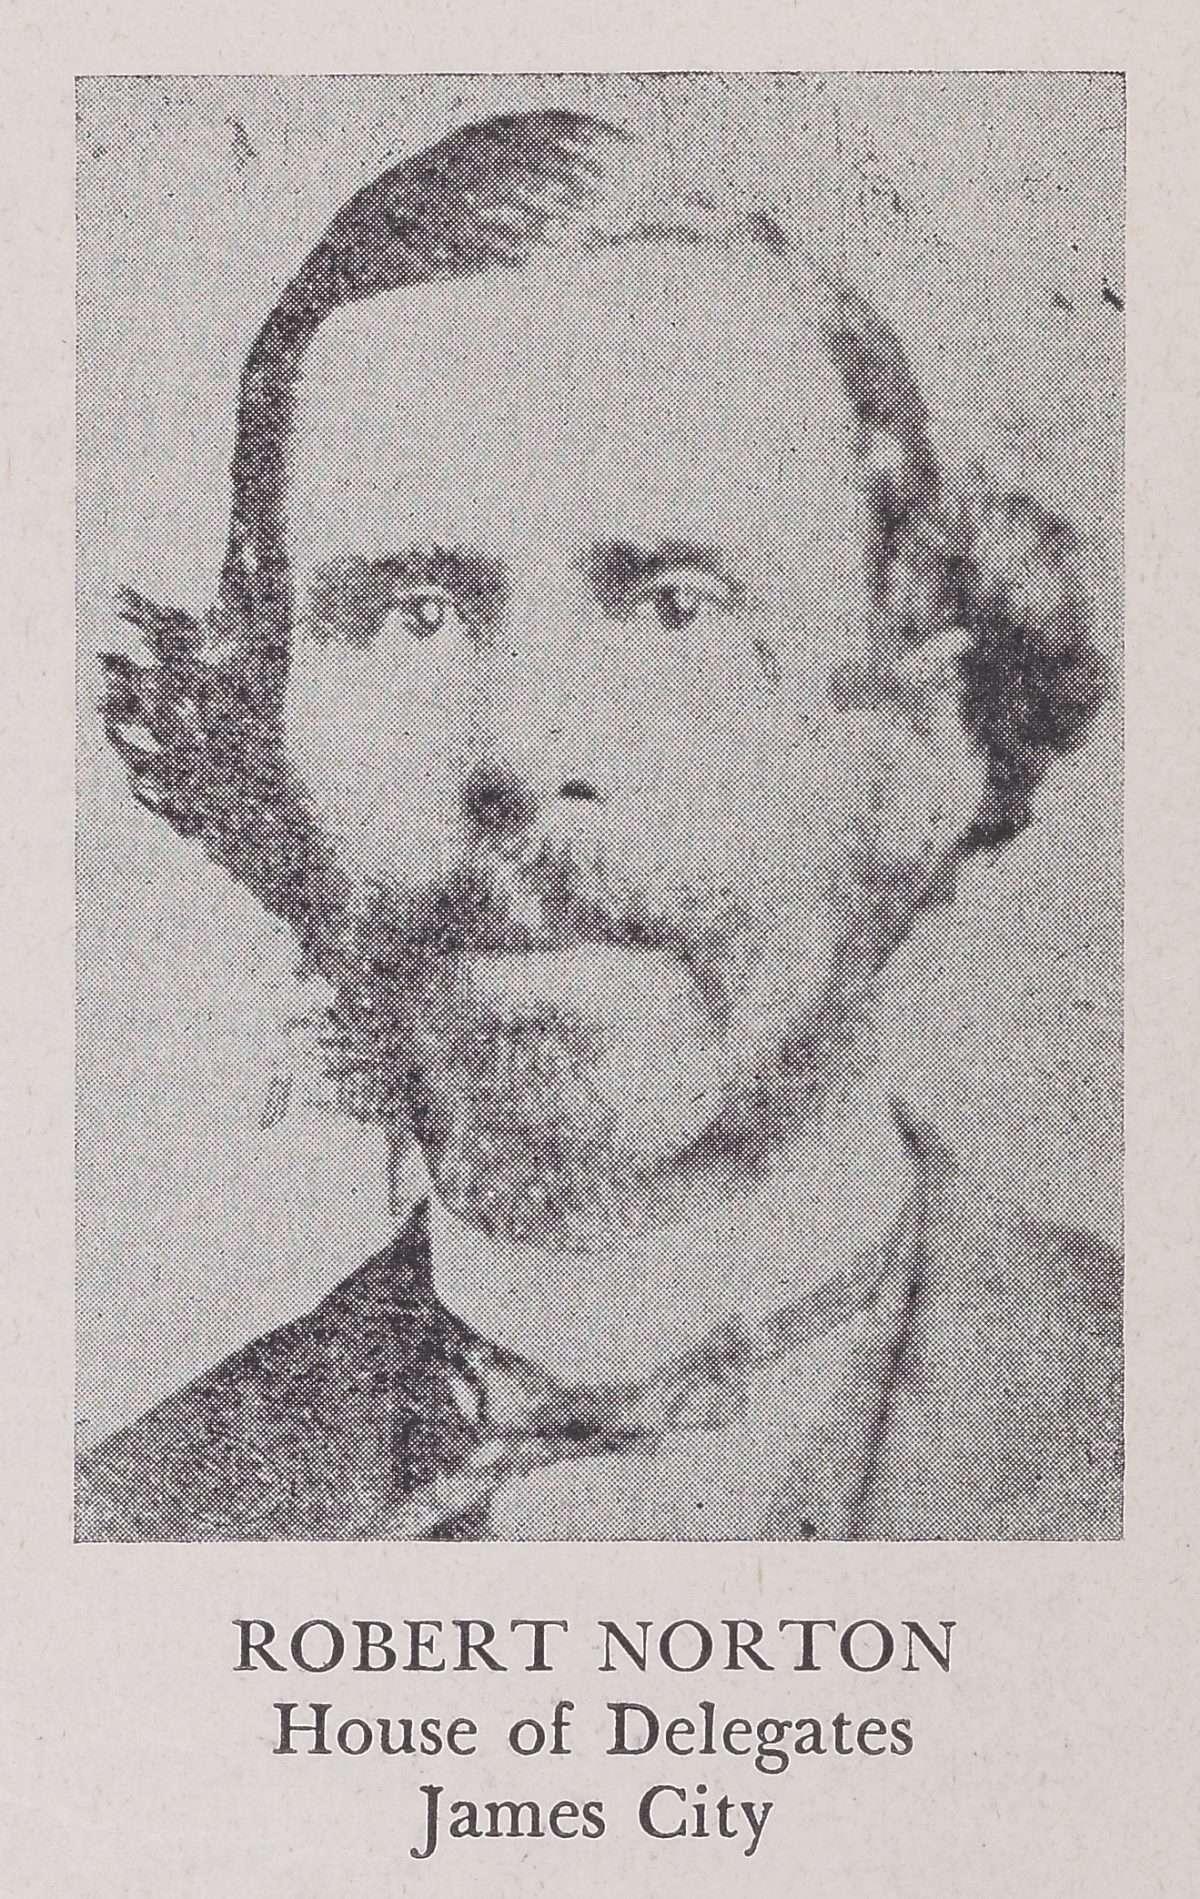 Robert Norton